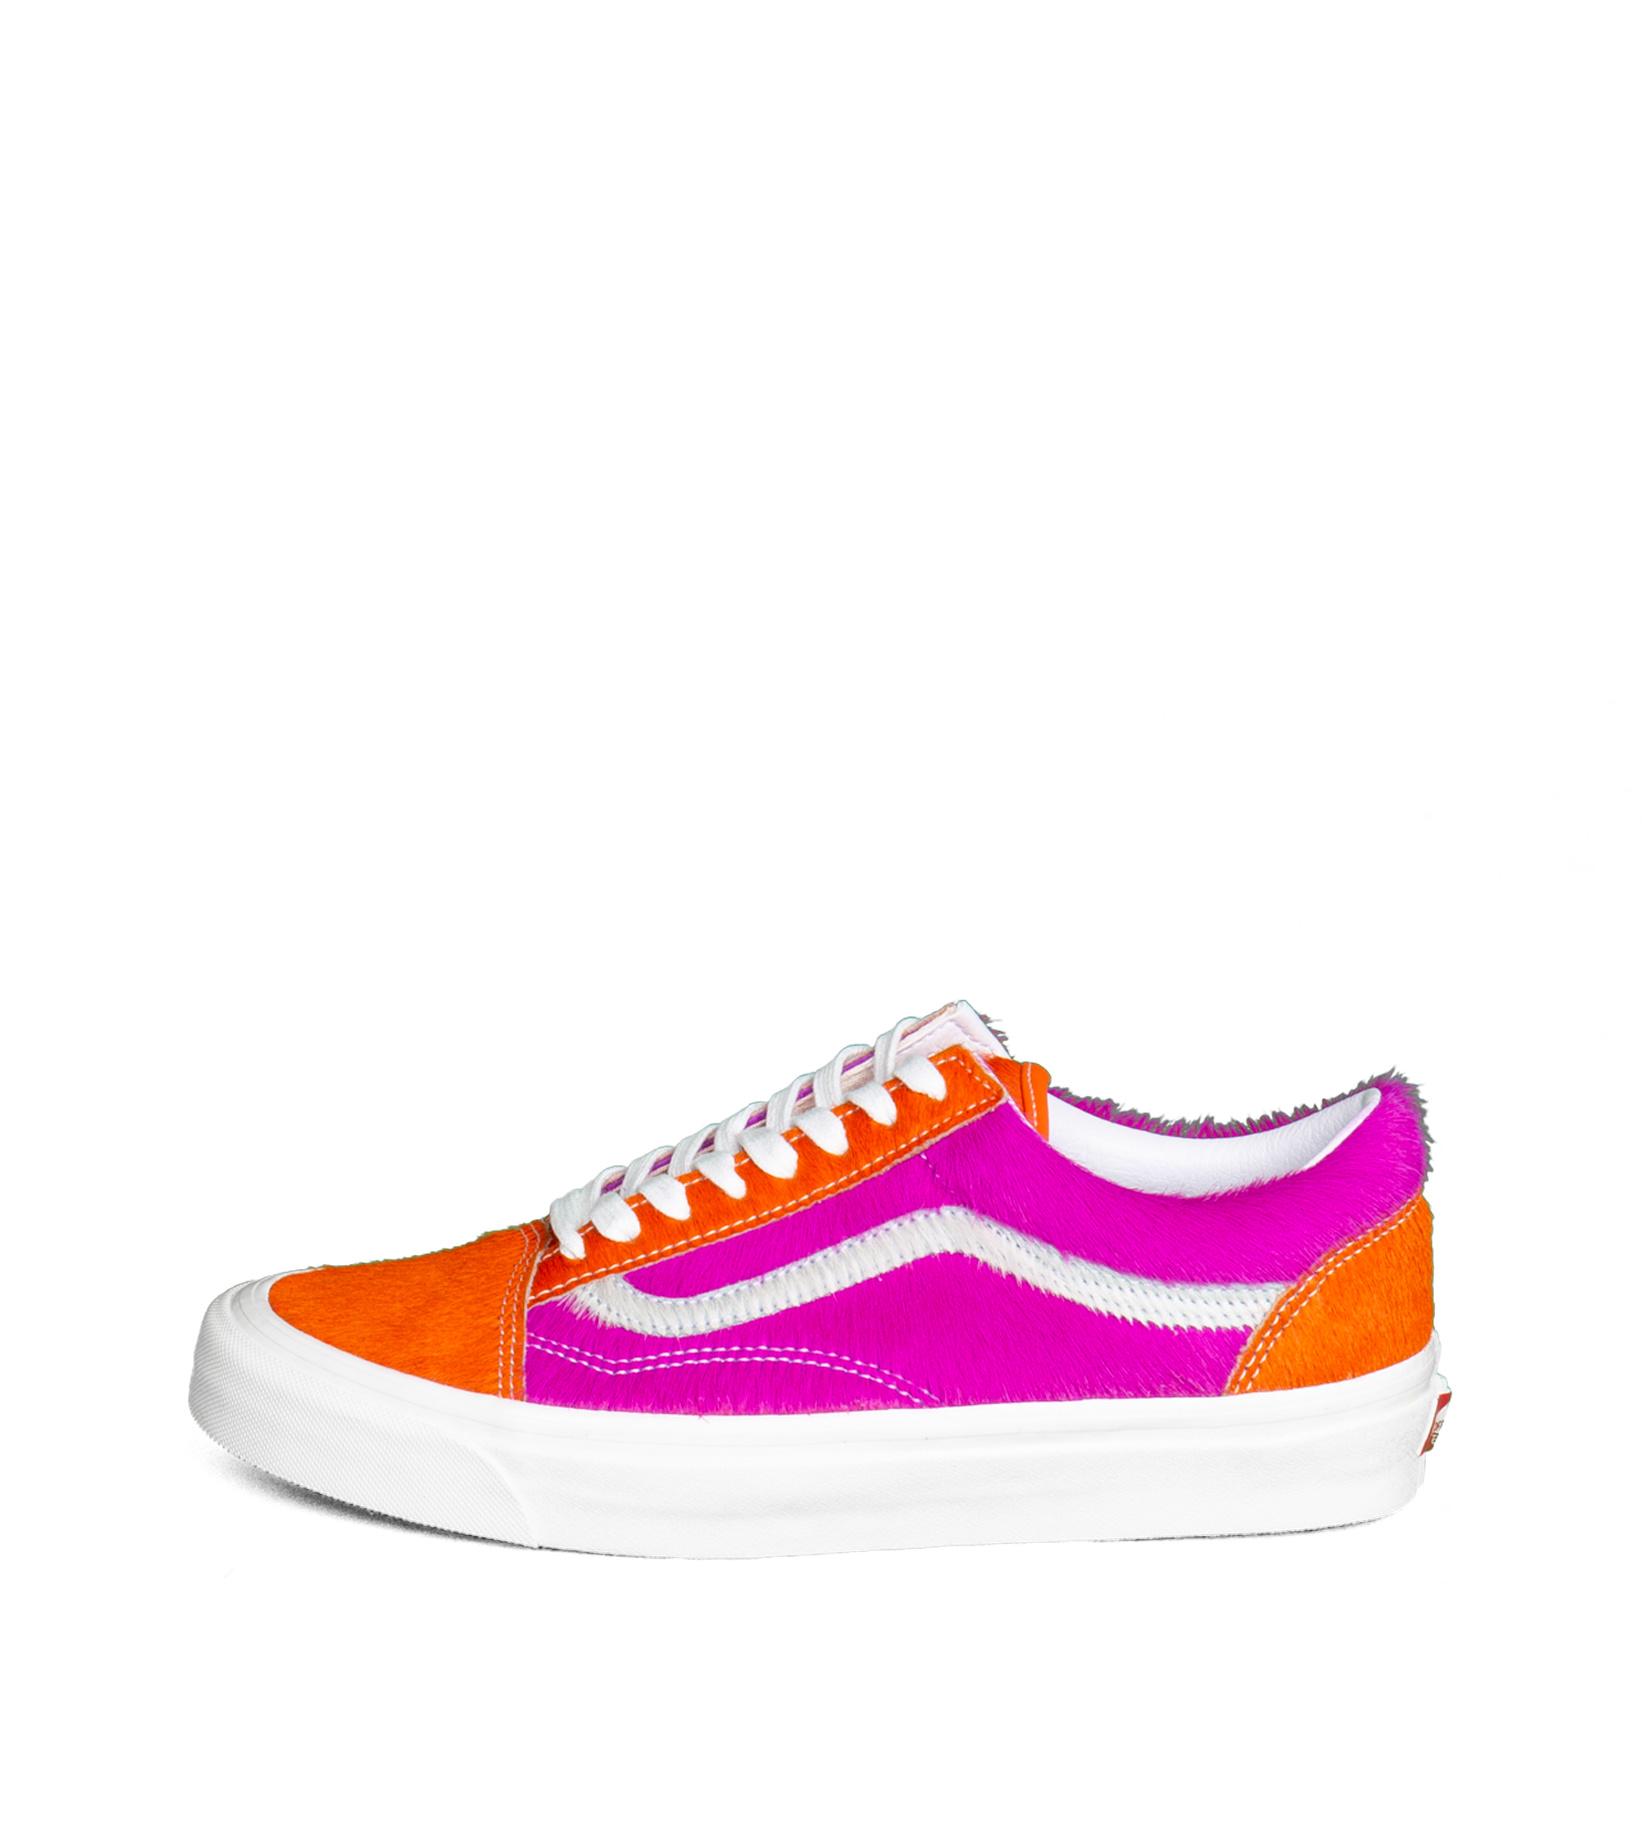 "Old Skool 36 DX (Anaheim Factory) ""Pink Pony/True White""-3"